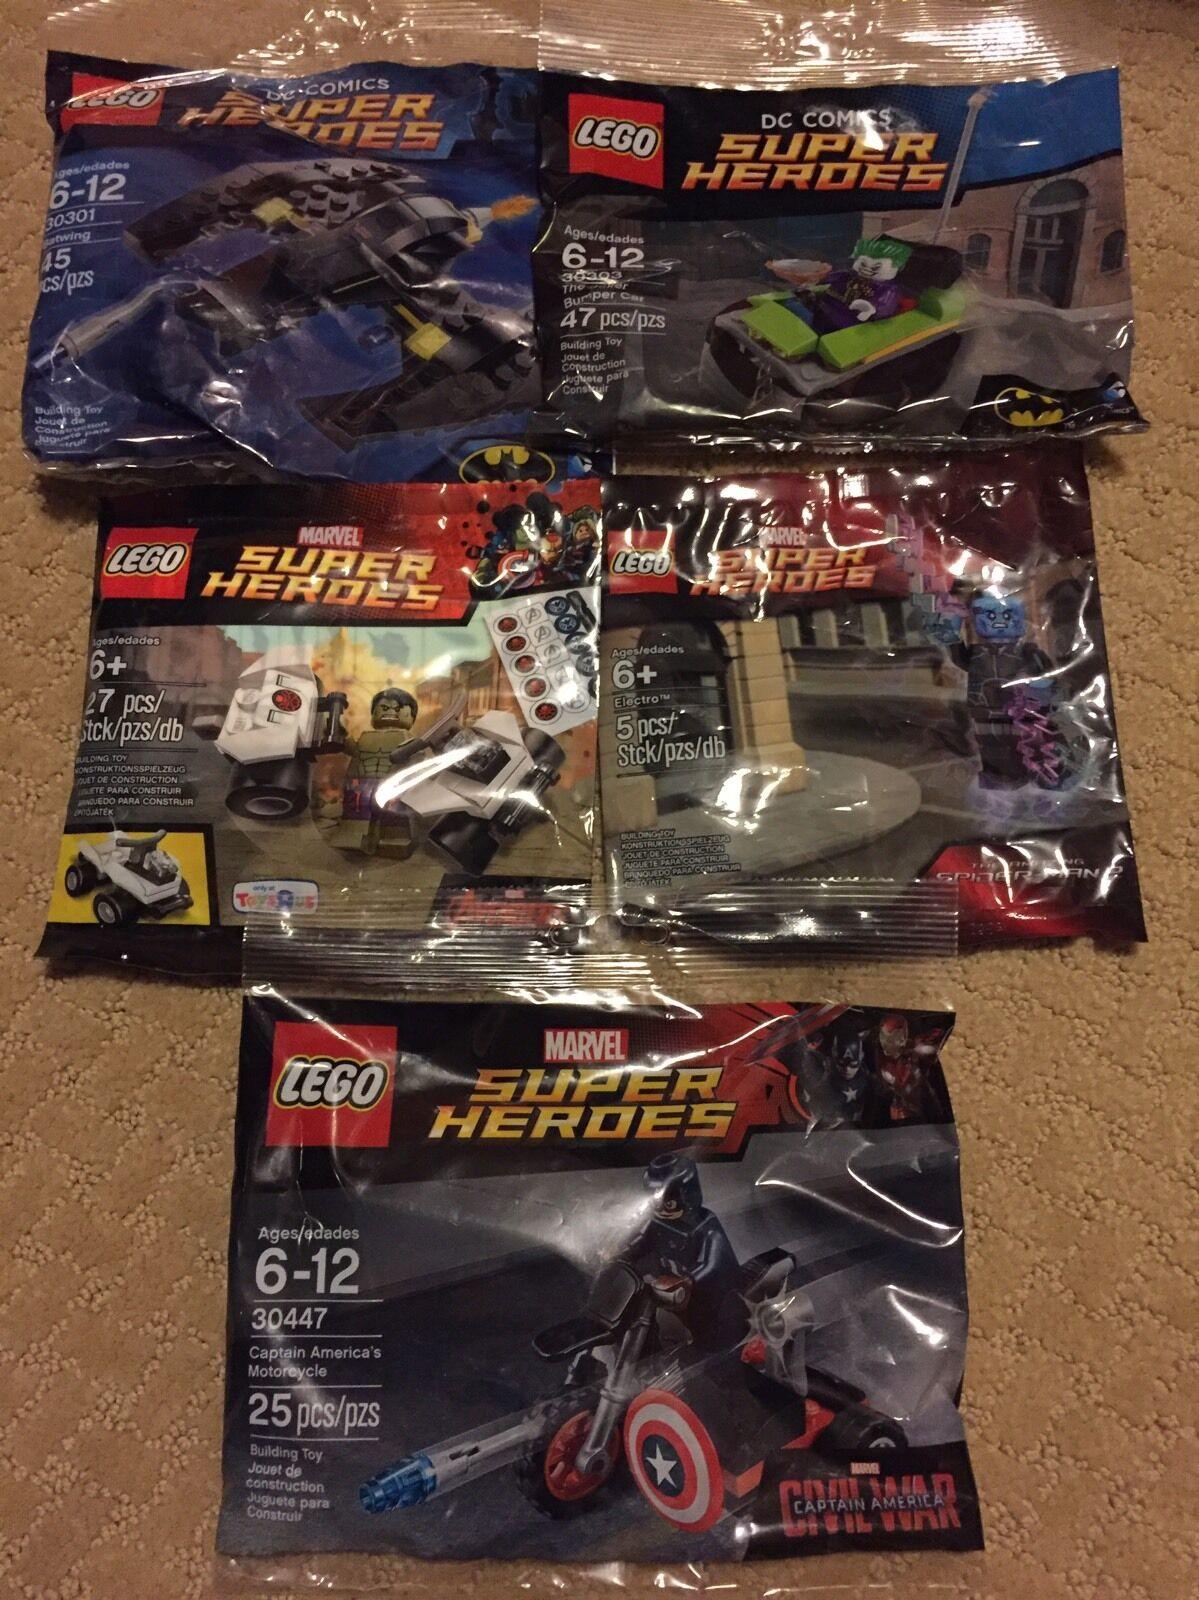 Lego Lego Lego Super Heroes Polybag Lot 5 - Captain America, Hulk, Electro, Joker, Batwing 78b1f4